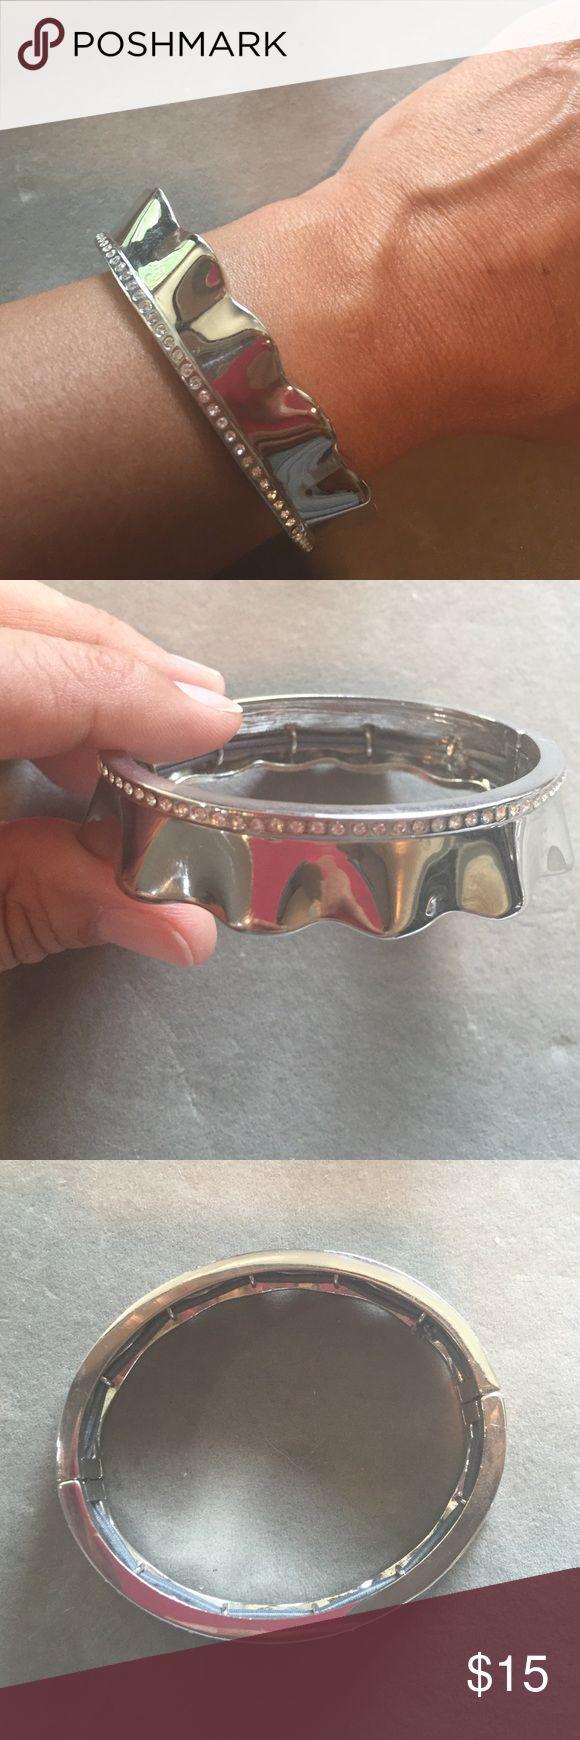 Lia Sophia stretch bracelet Lia Sophia stretch bracelet Lia Sophia Jewelry Bracelets